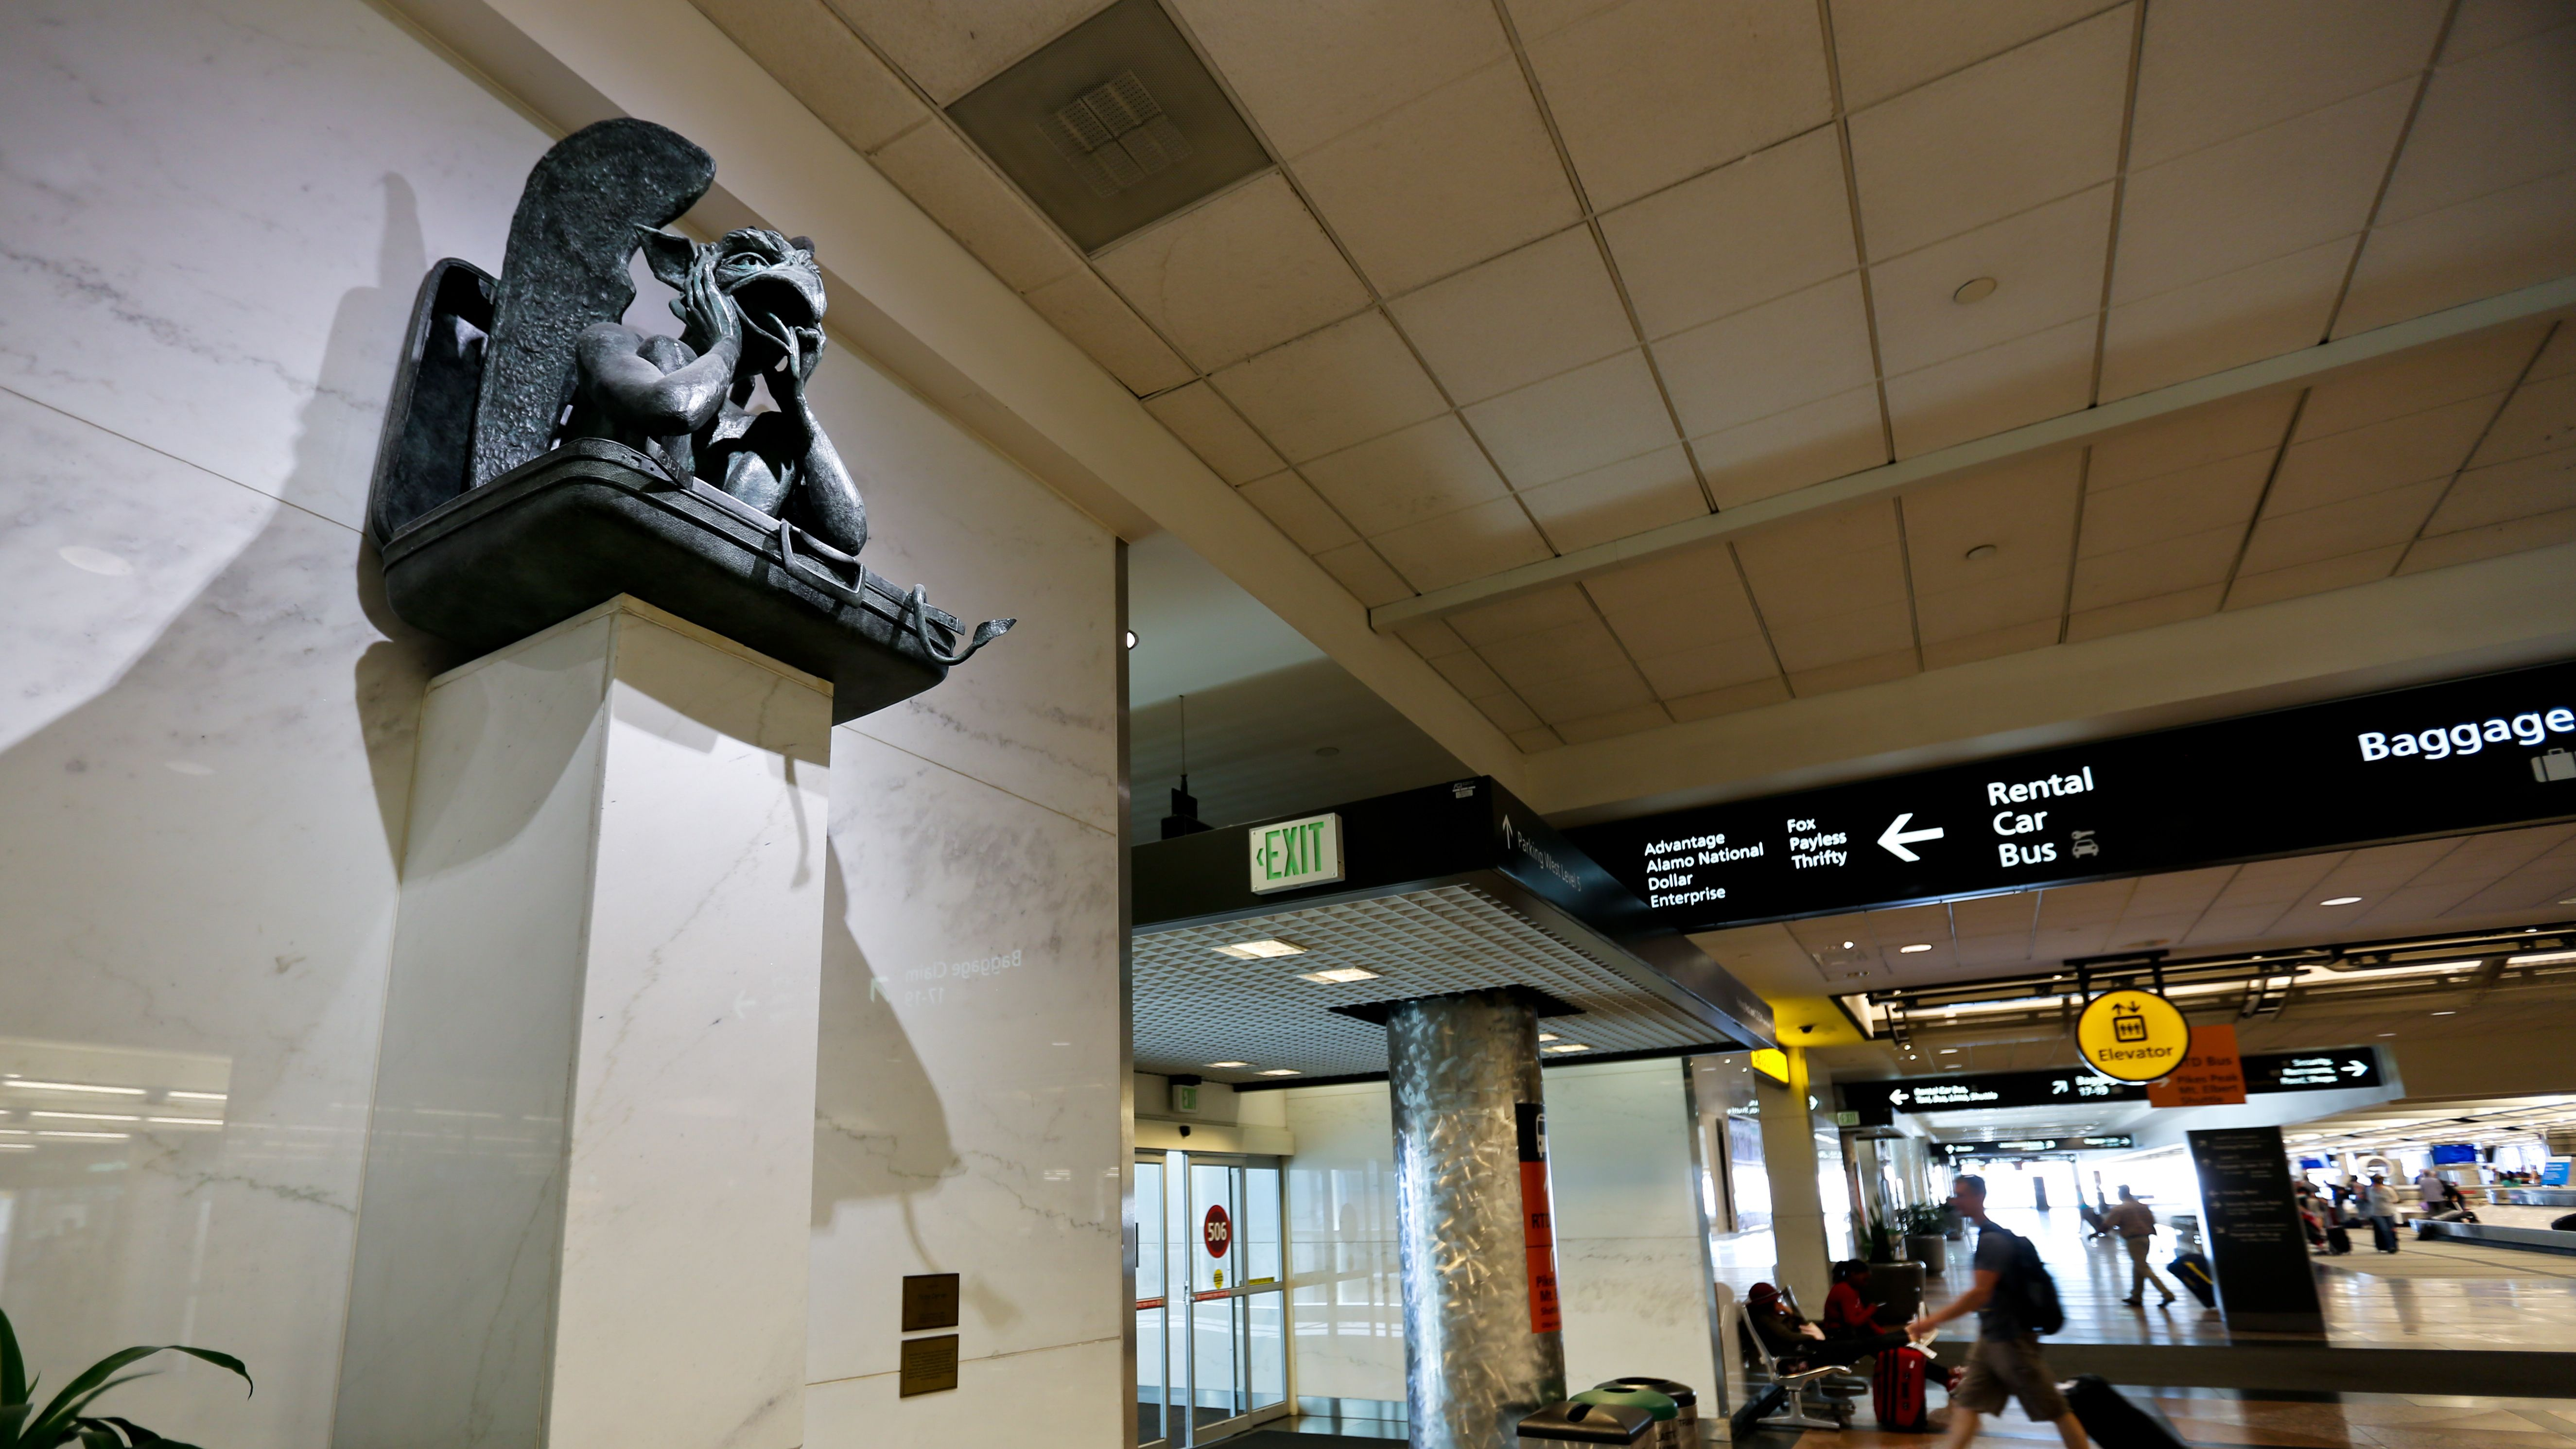 Denver International Airport Installs Talking Gargoyle as a Nod to Conspiracy Theories